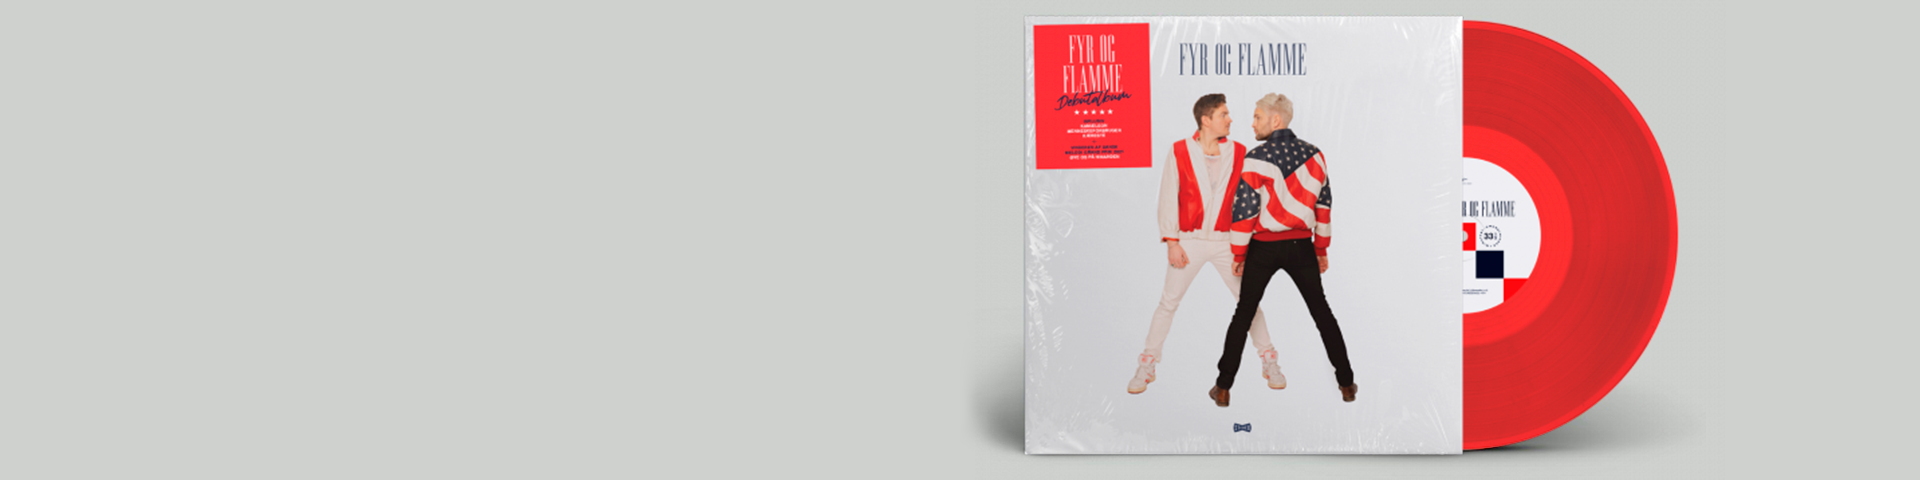 /f/y/fyr-og-flamme-vinyl-album.png